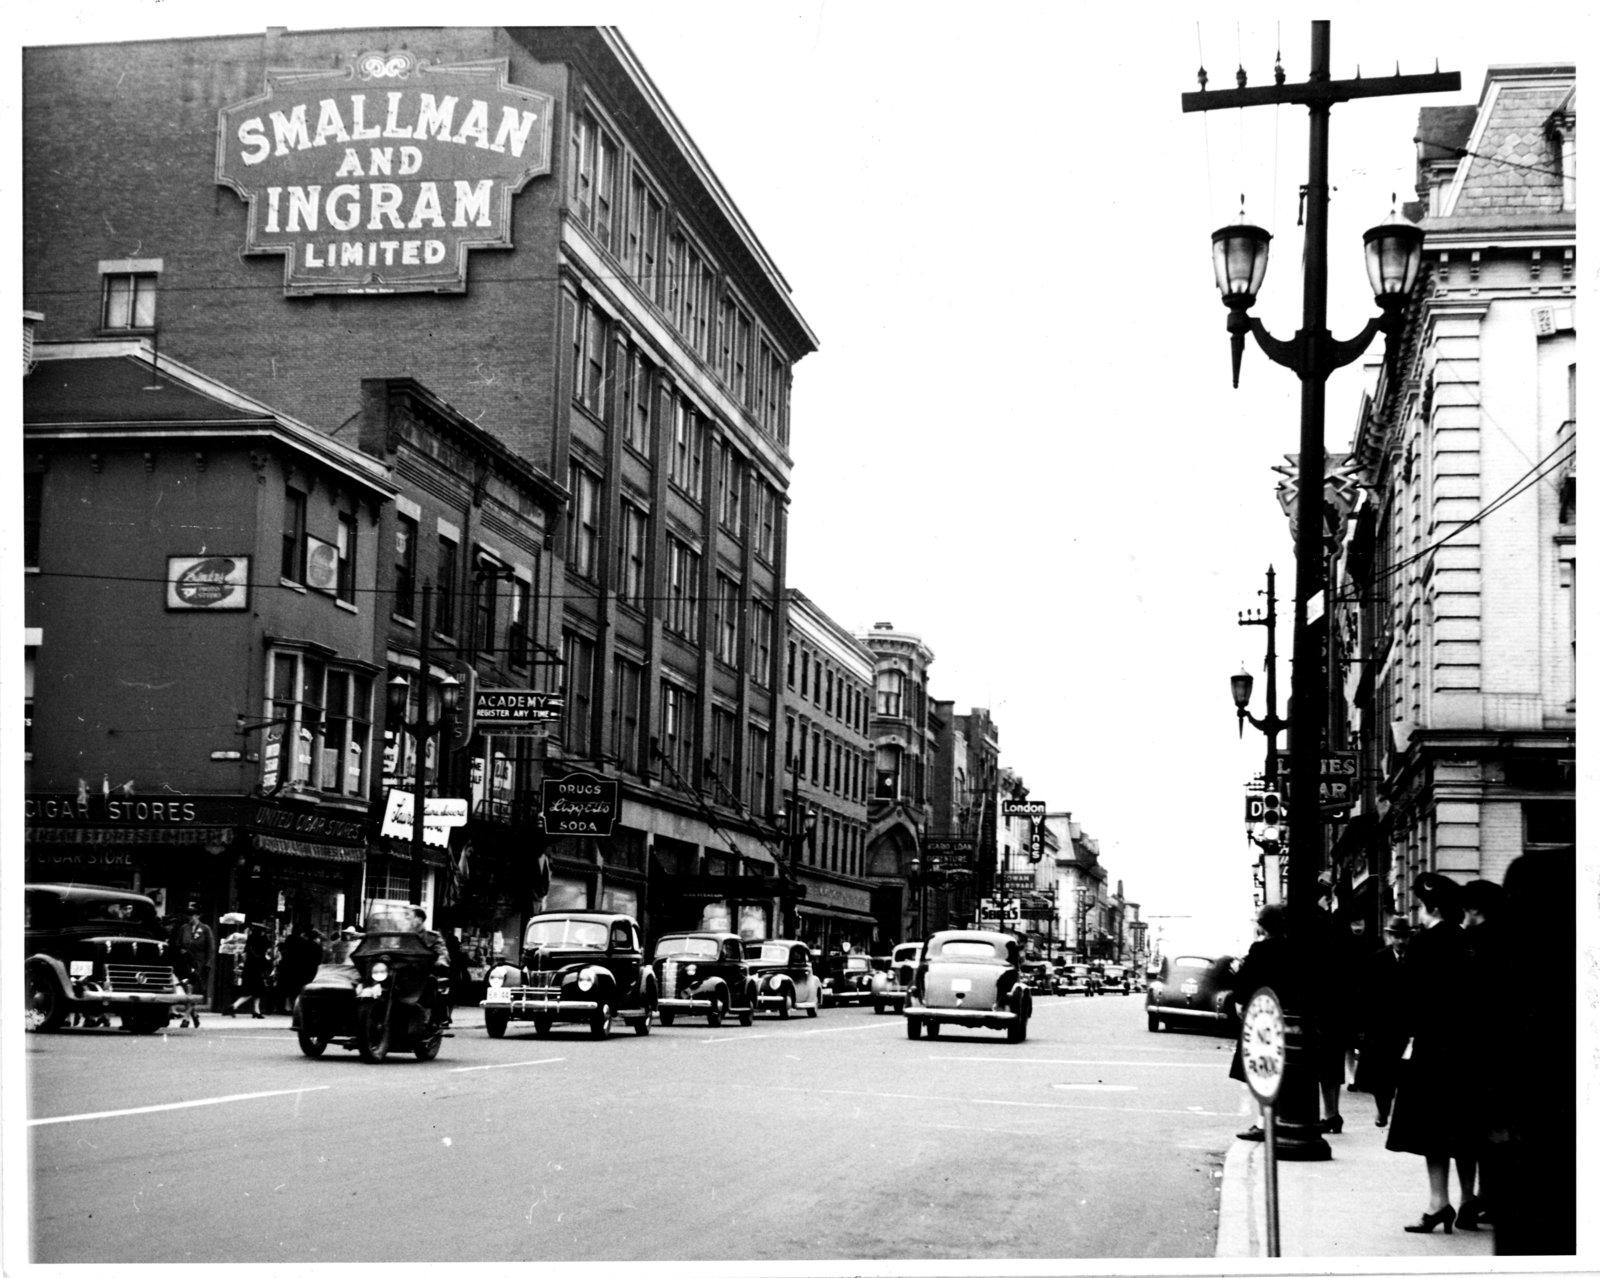 Dundas Street, looking west from Richmond Street, London, Ontario